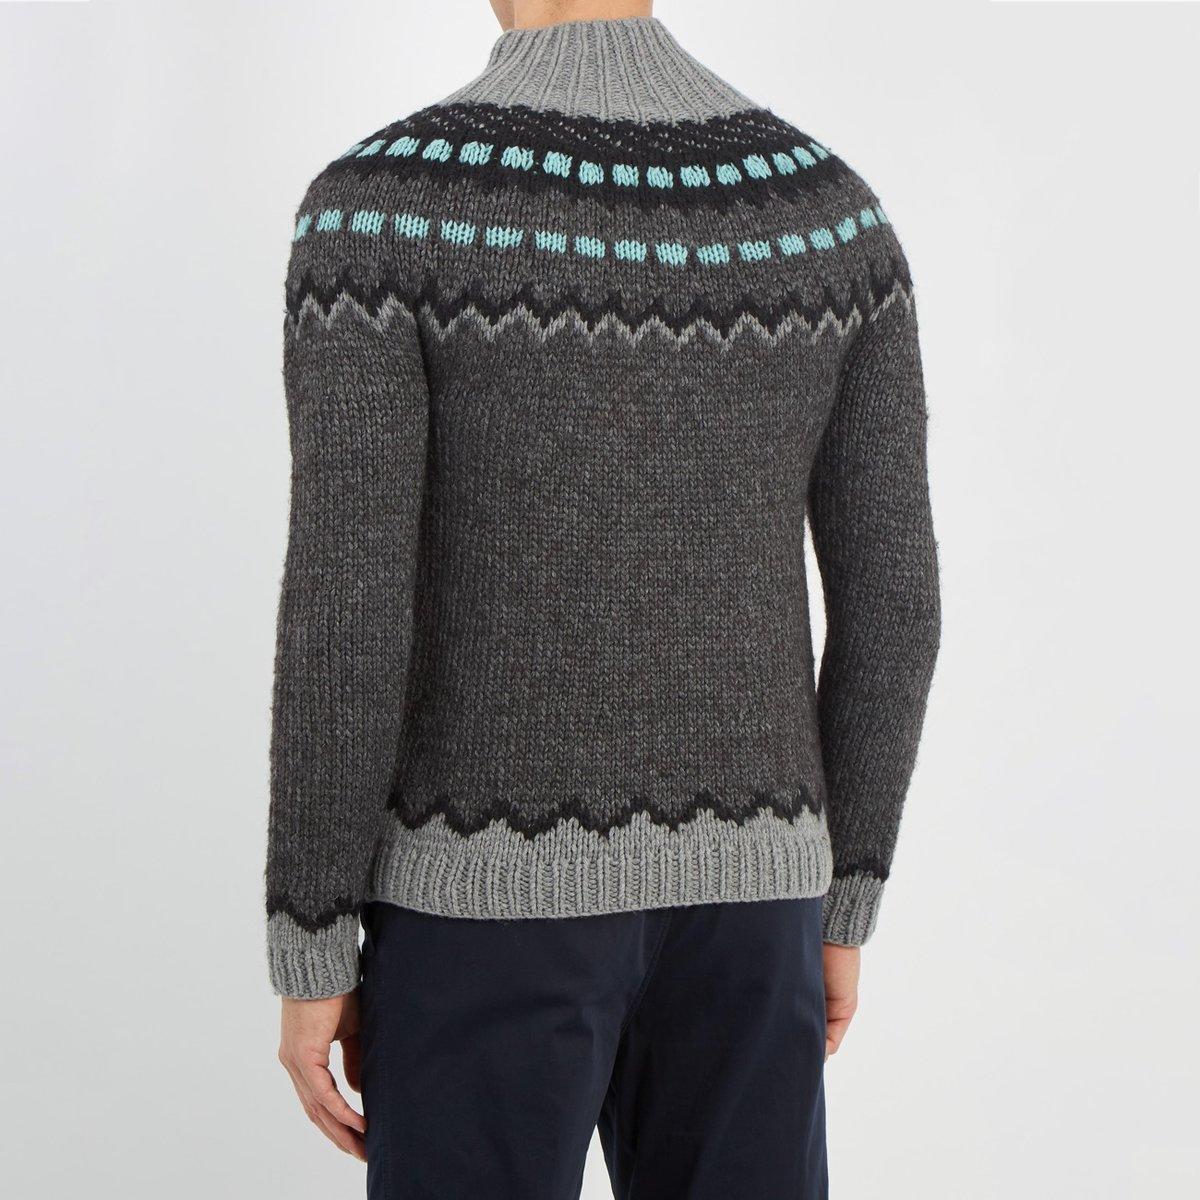 valentino-GREY-Funnel-neck-Geometric-intarsia-Sweater (5).jpg